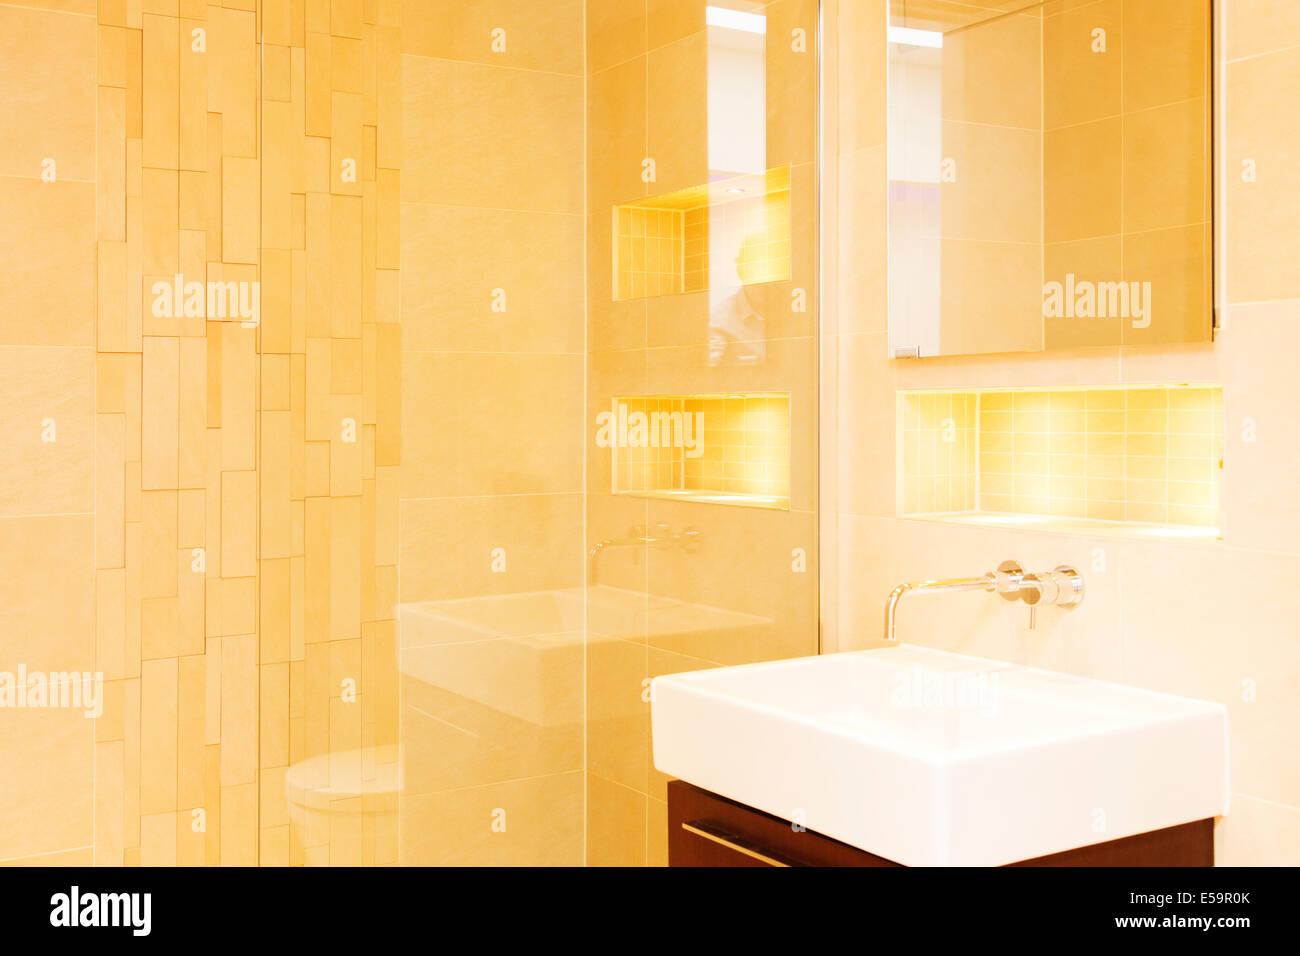 contemporary photos contemporary images alamy. Black Bedroom Furniture Sets. Home Design Ideas